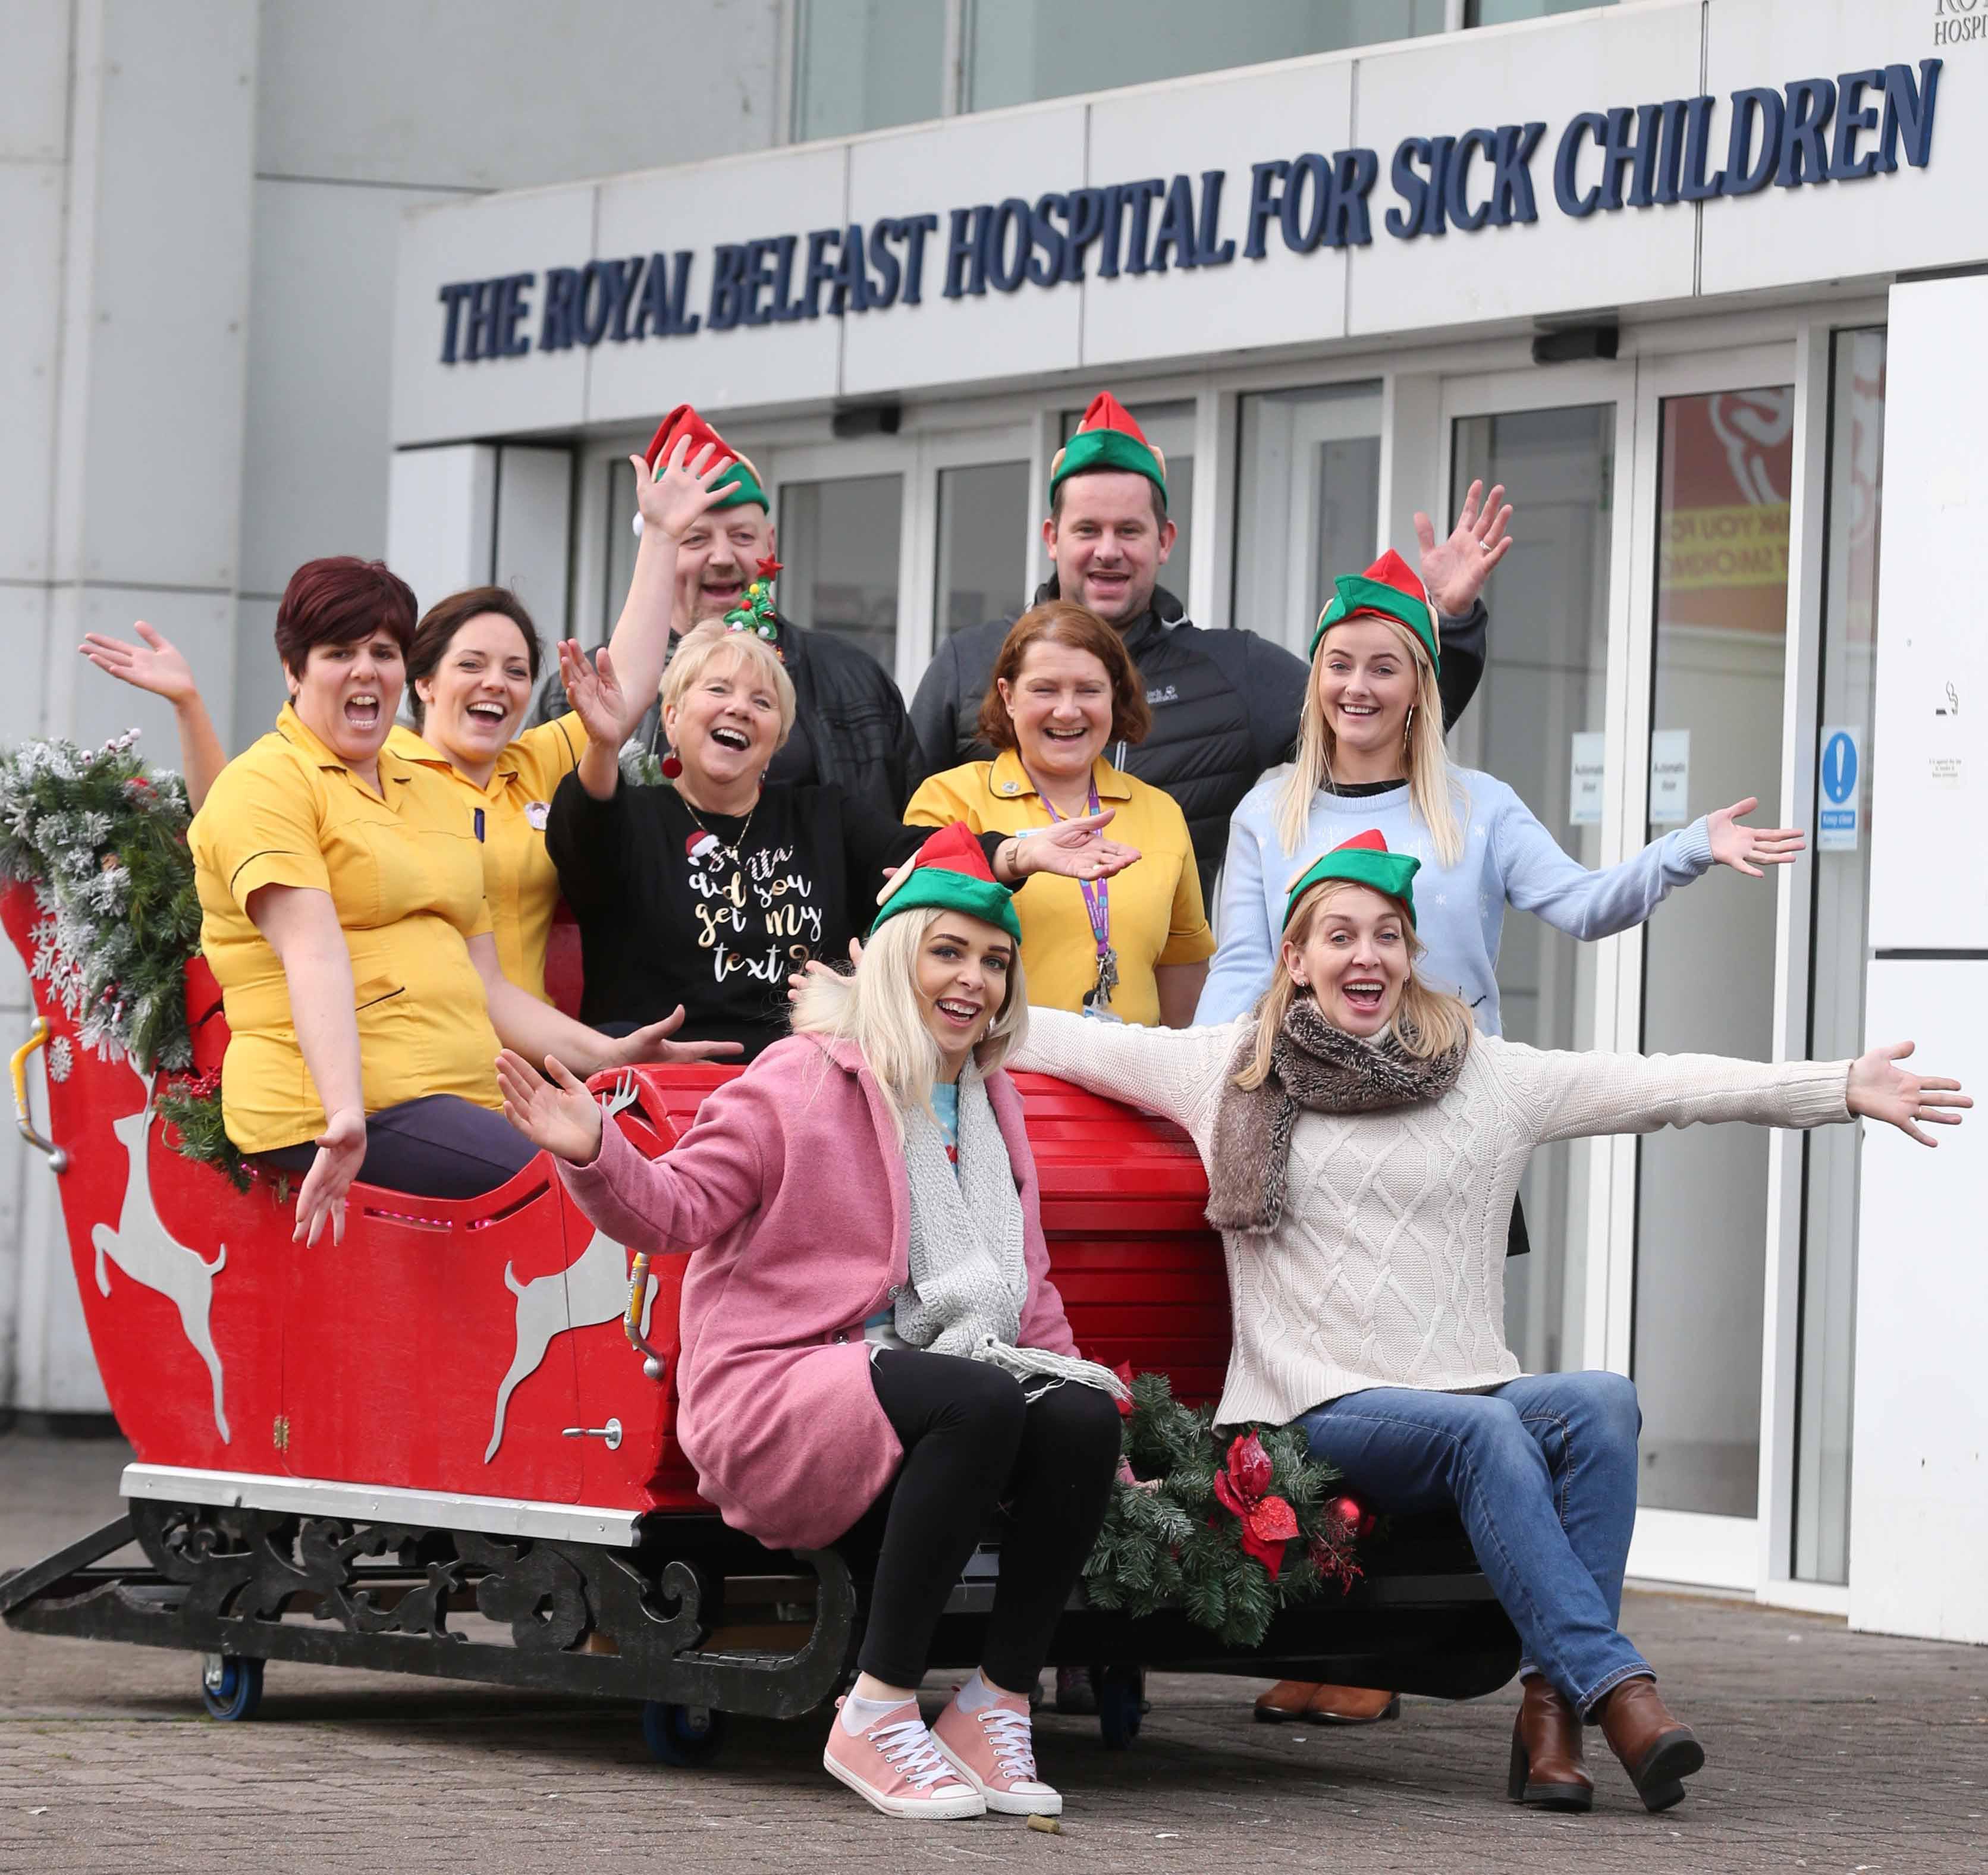 Children's Hospital activity day #5